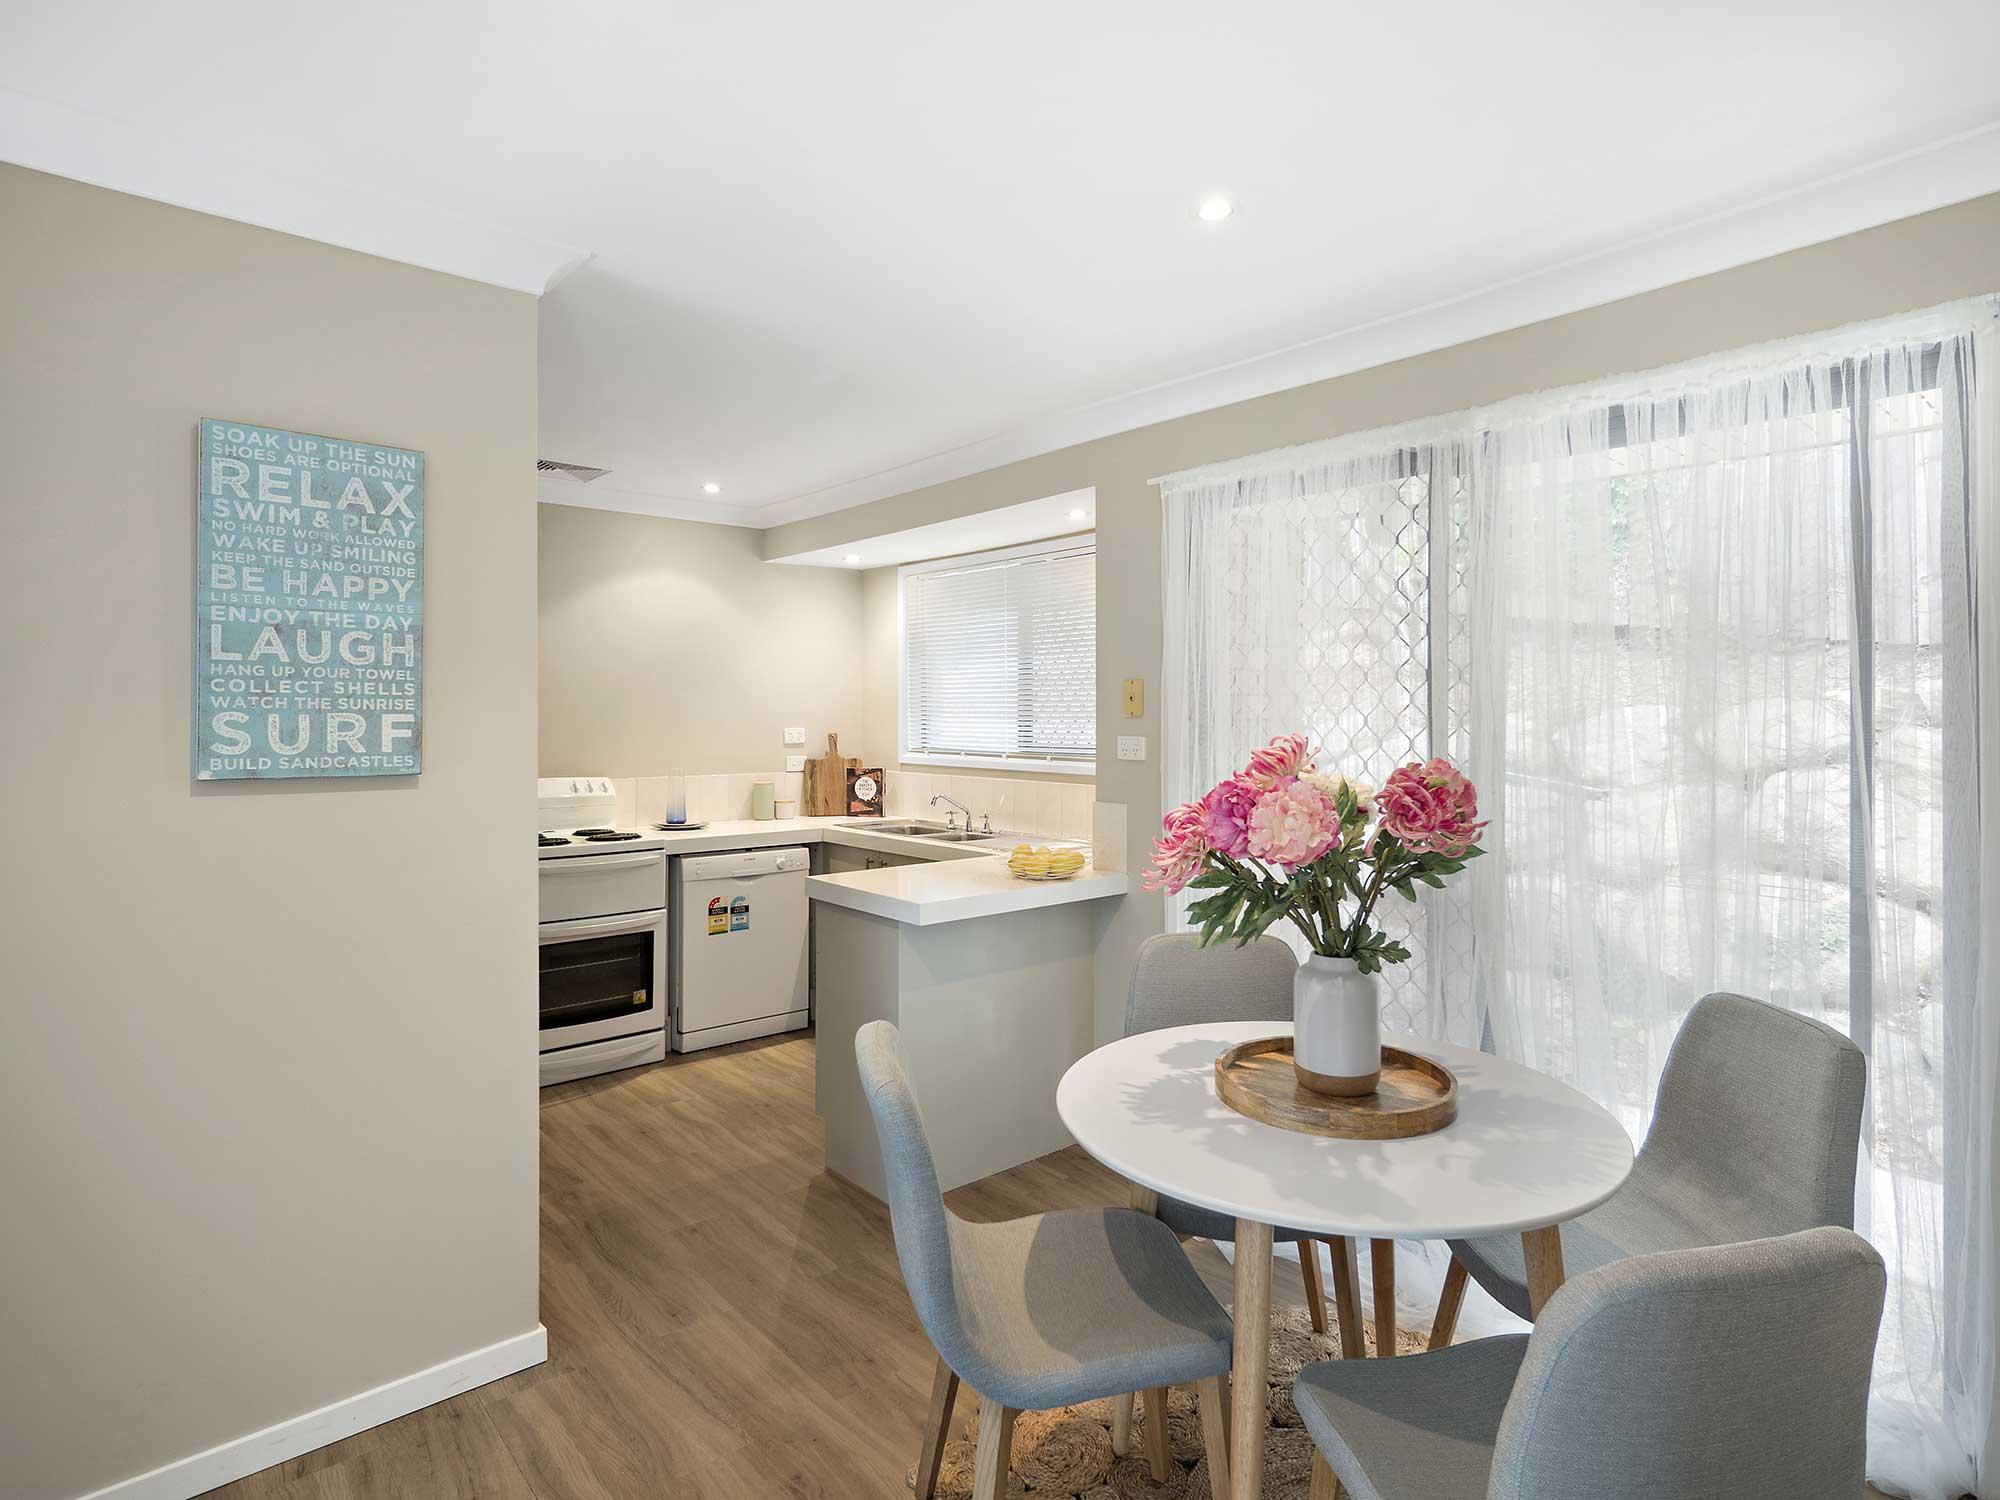 Brisbane prestige property photography by Phil Savory Photography